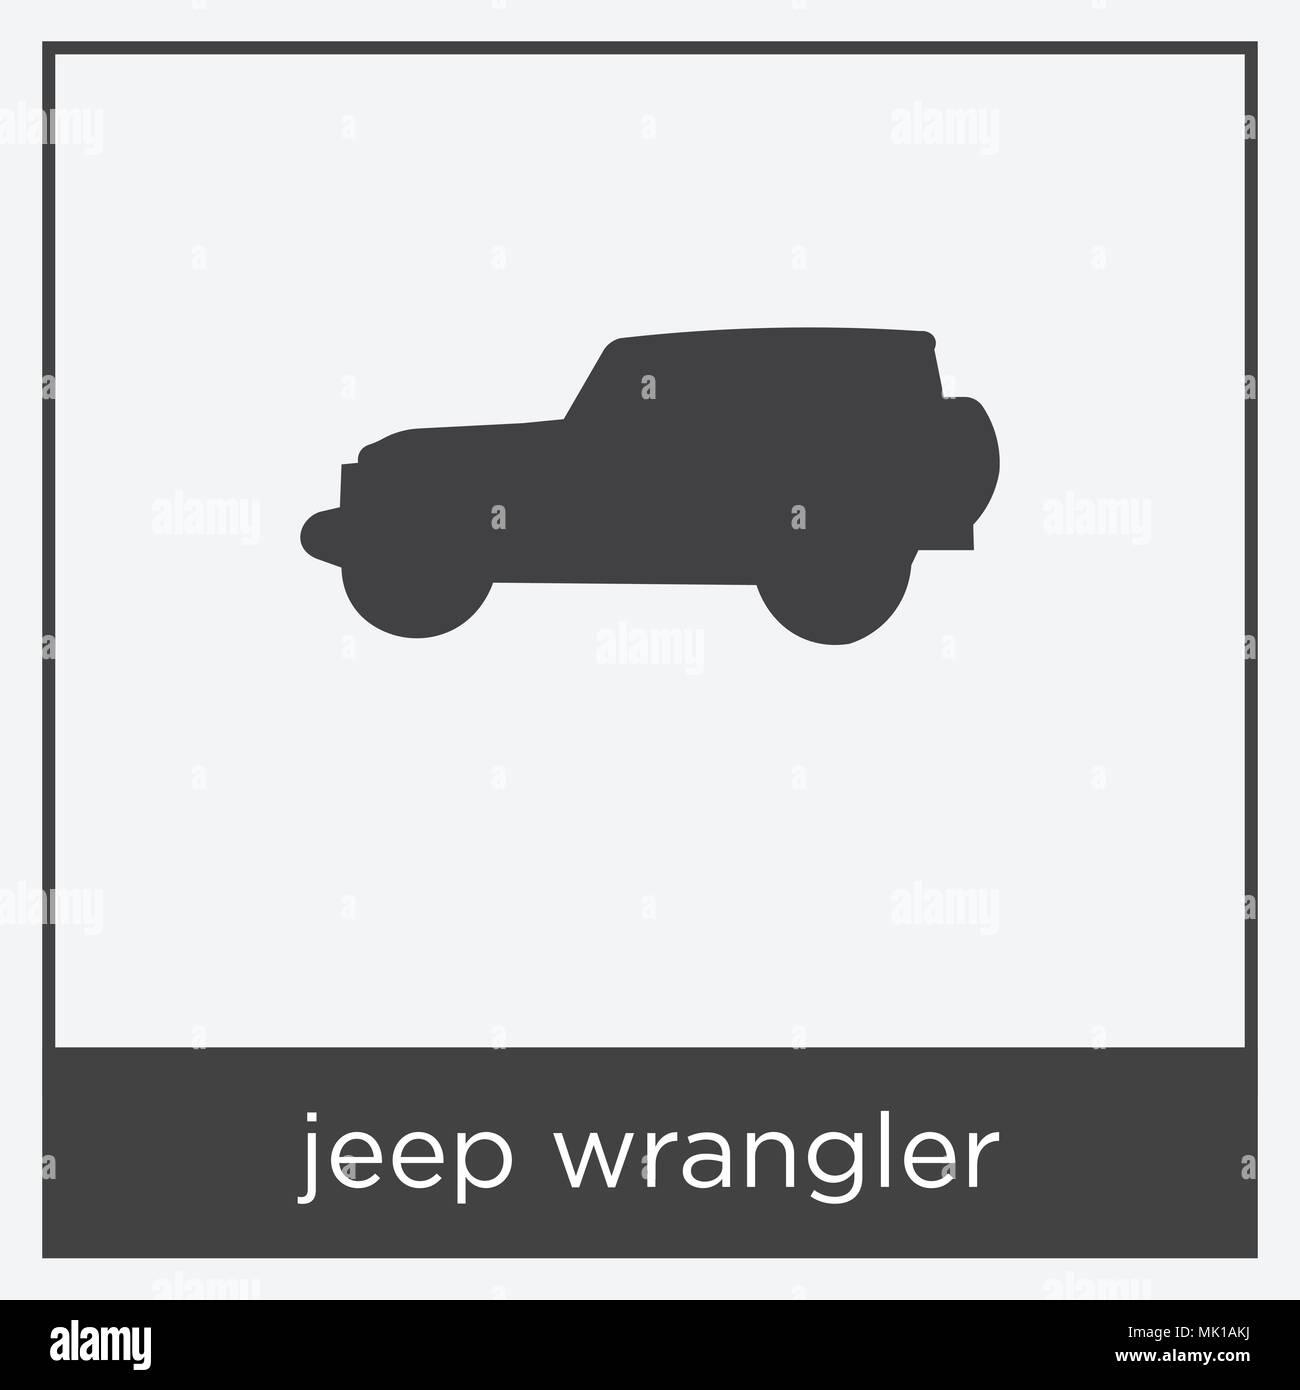 Atemberaubend Yj Jeep Rahmen Zum Verkauf Bilder - Rahmen Ideen ...